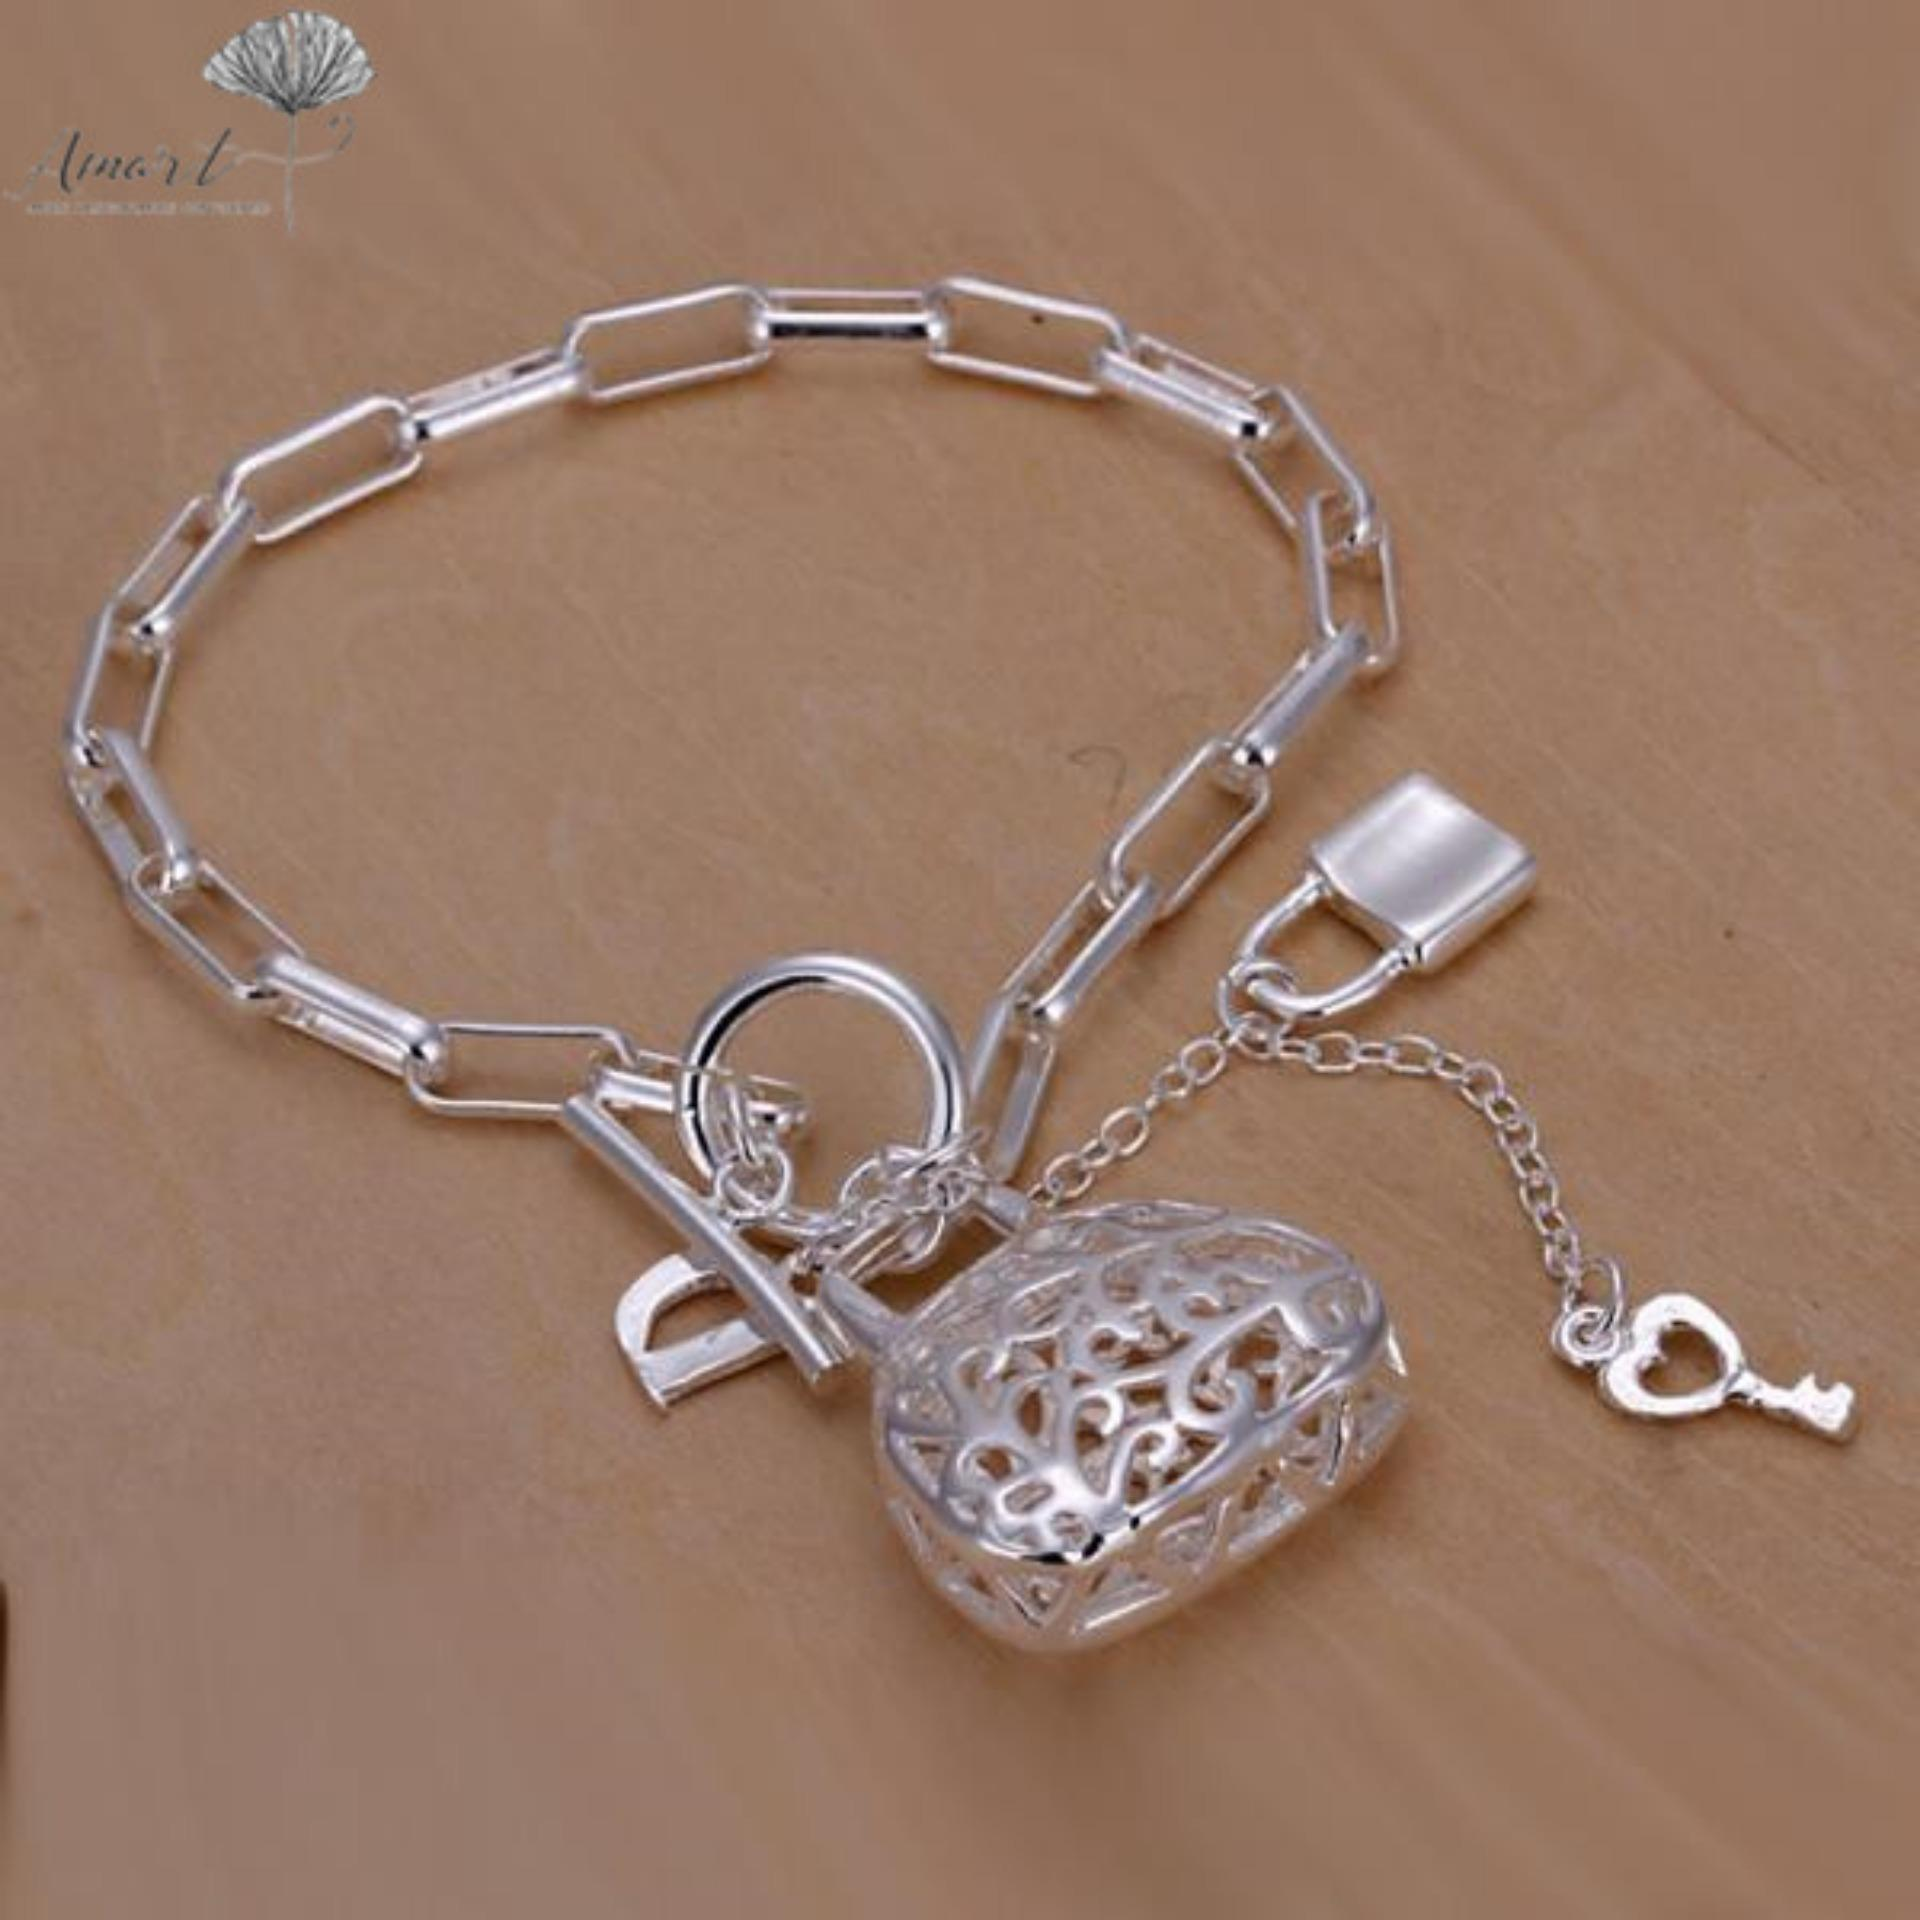 Amart Sterling Silver Cuff Chain Bracelet(Silver)